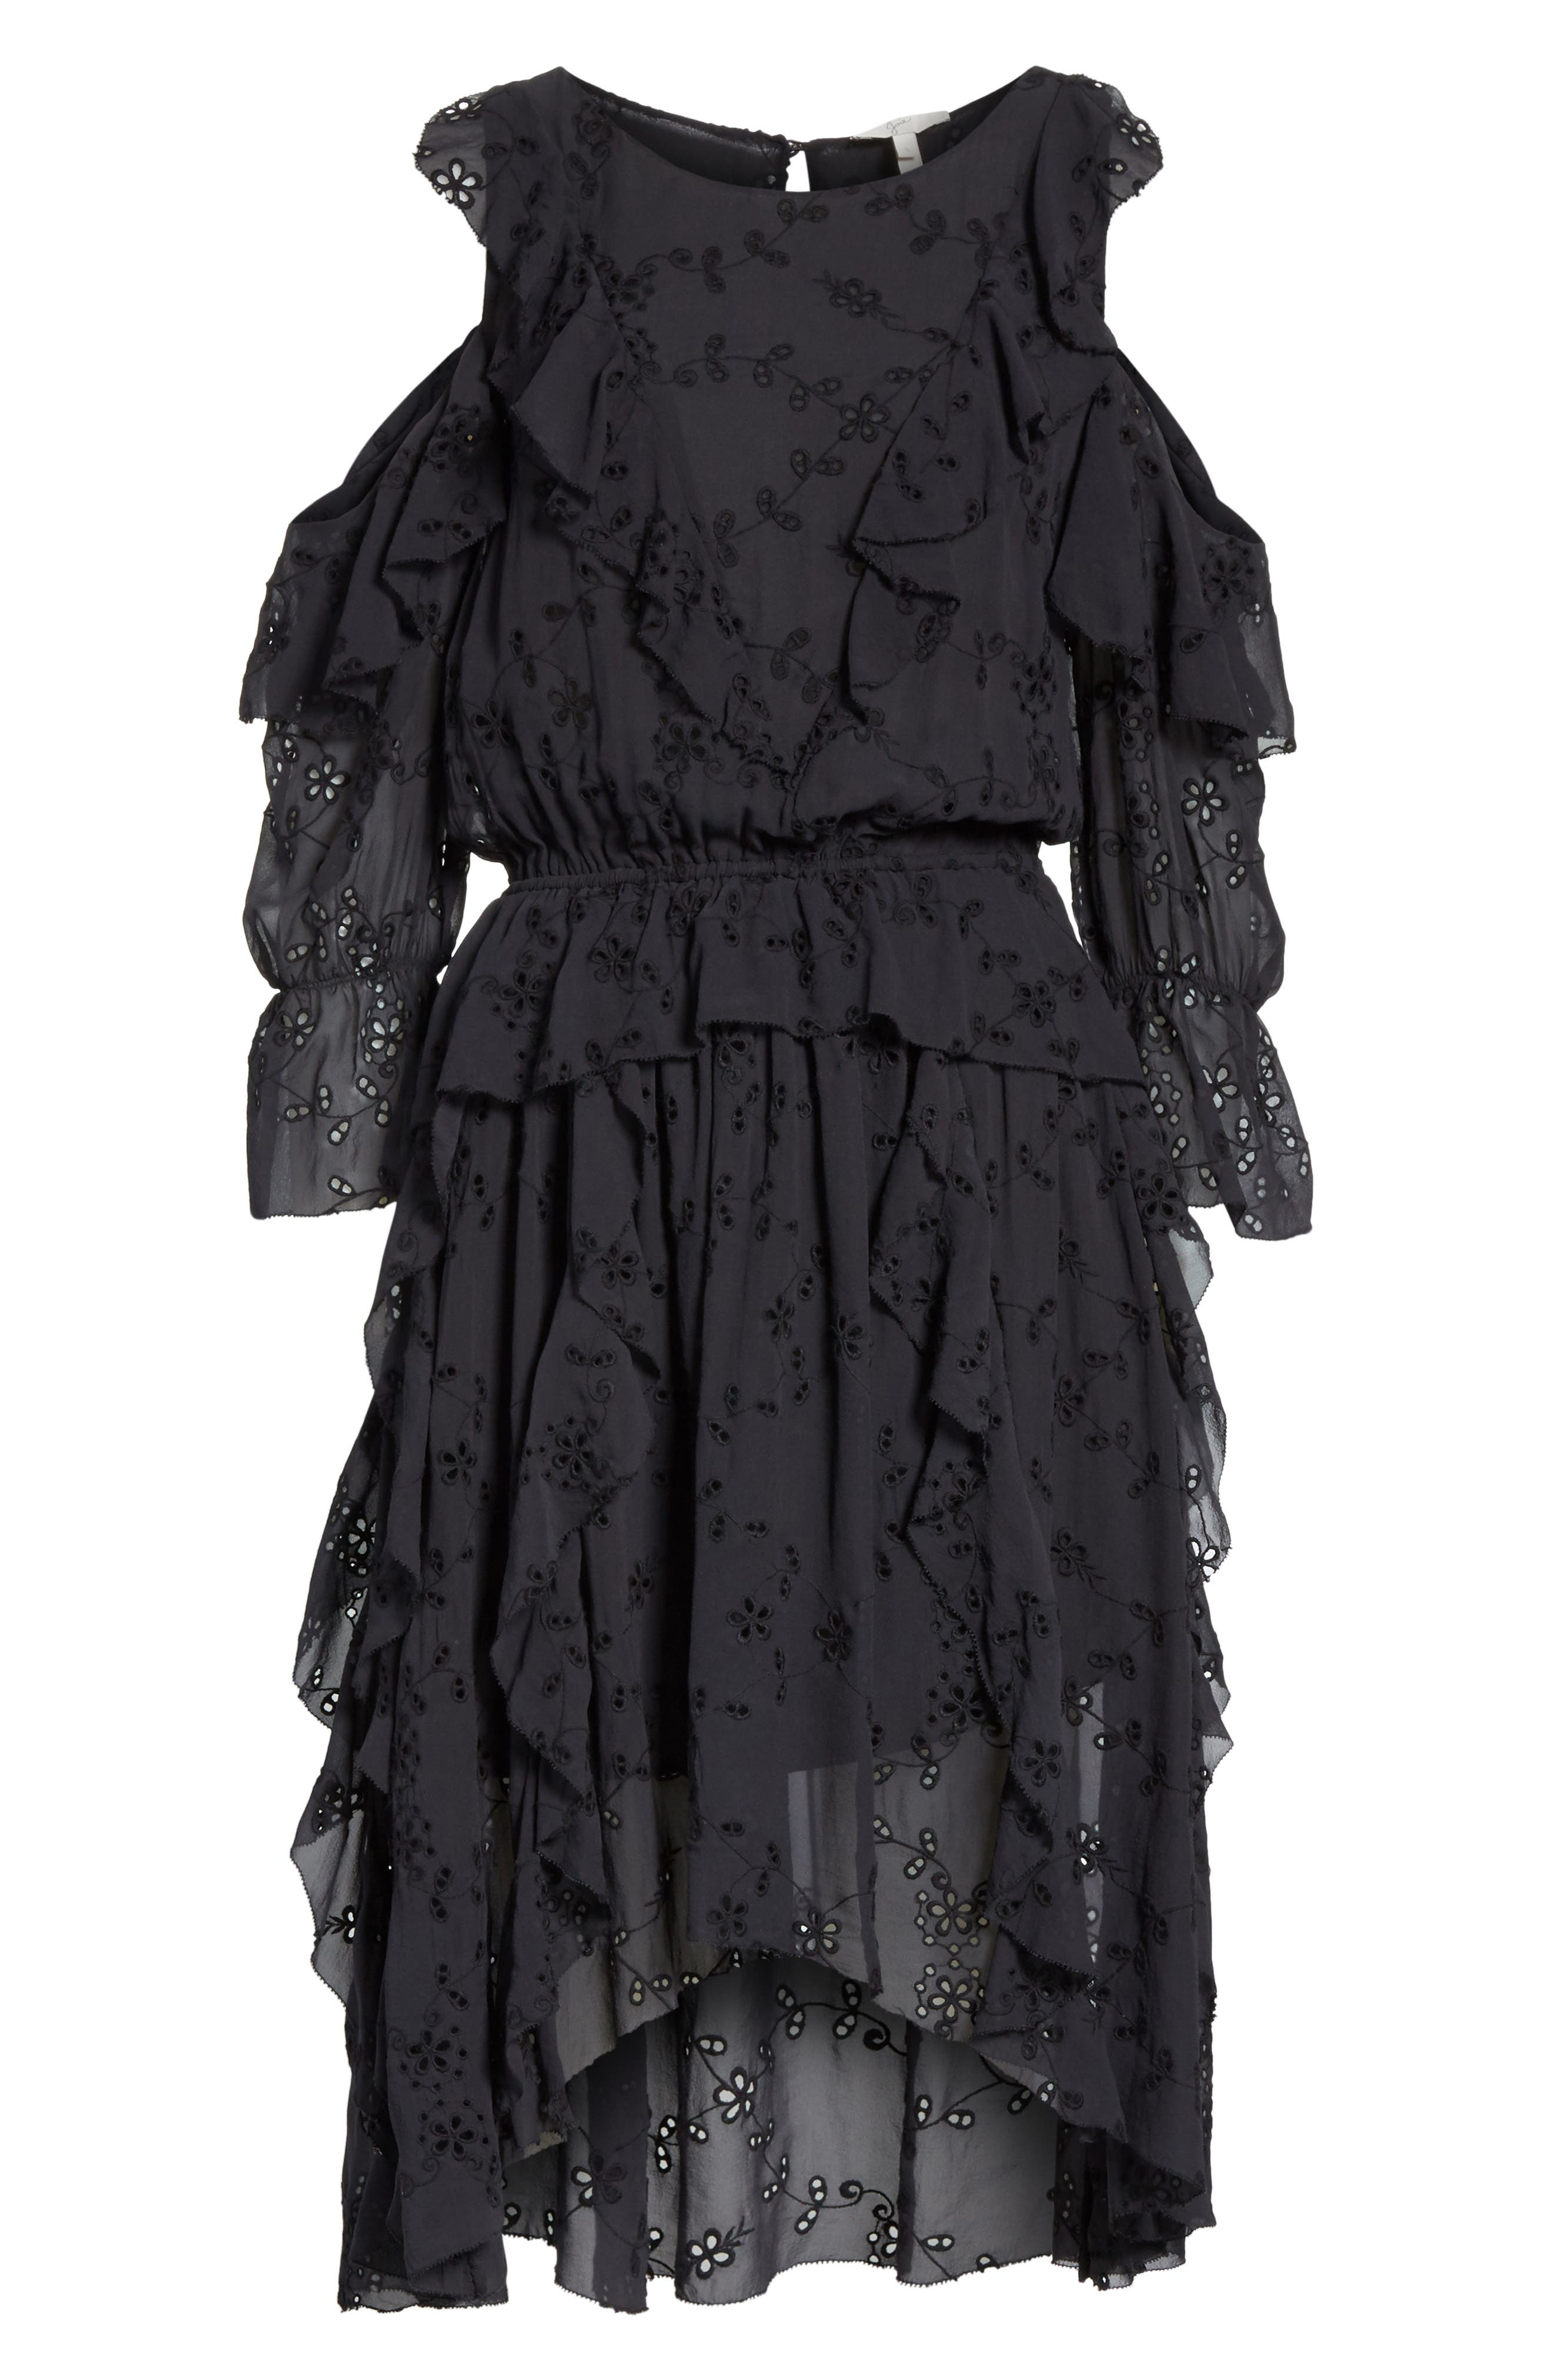 Alpheus Cold Shoulder Ruffled Silk Dress,                             Alternate thumbnail 6, color,                             Caviar/ Caviar